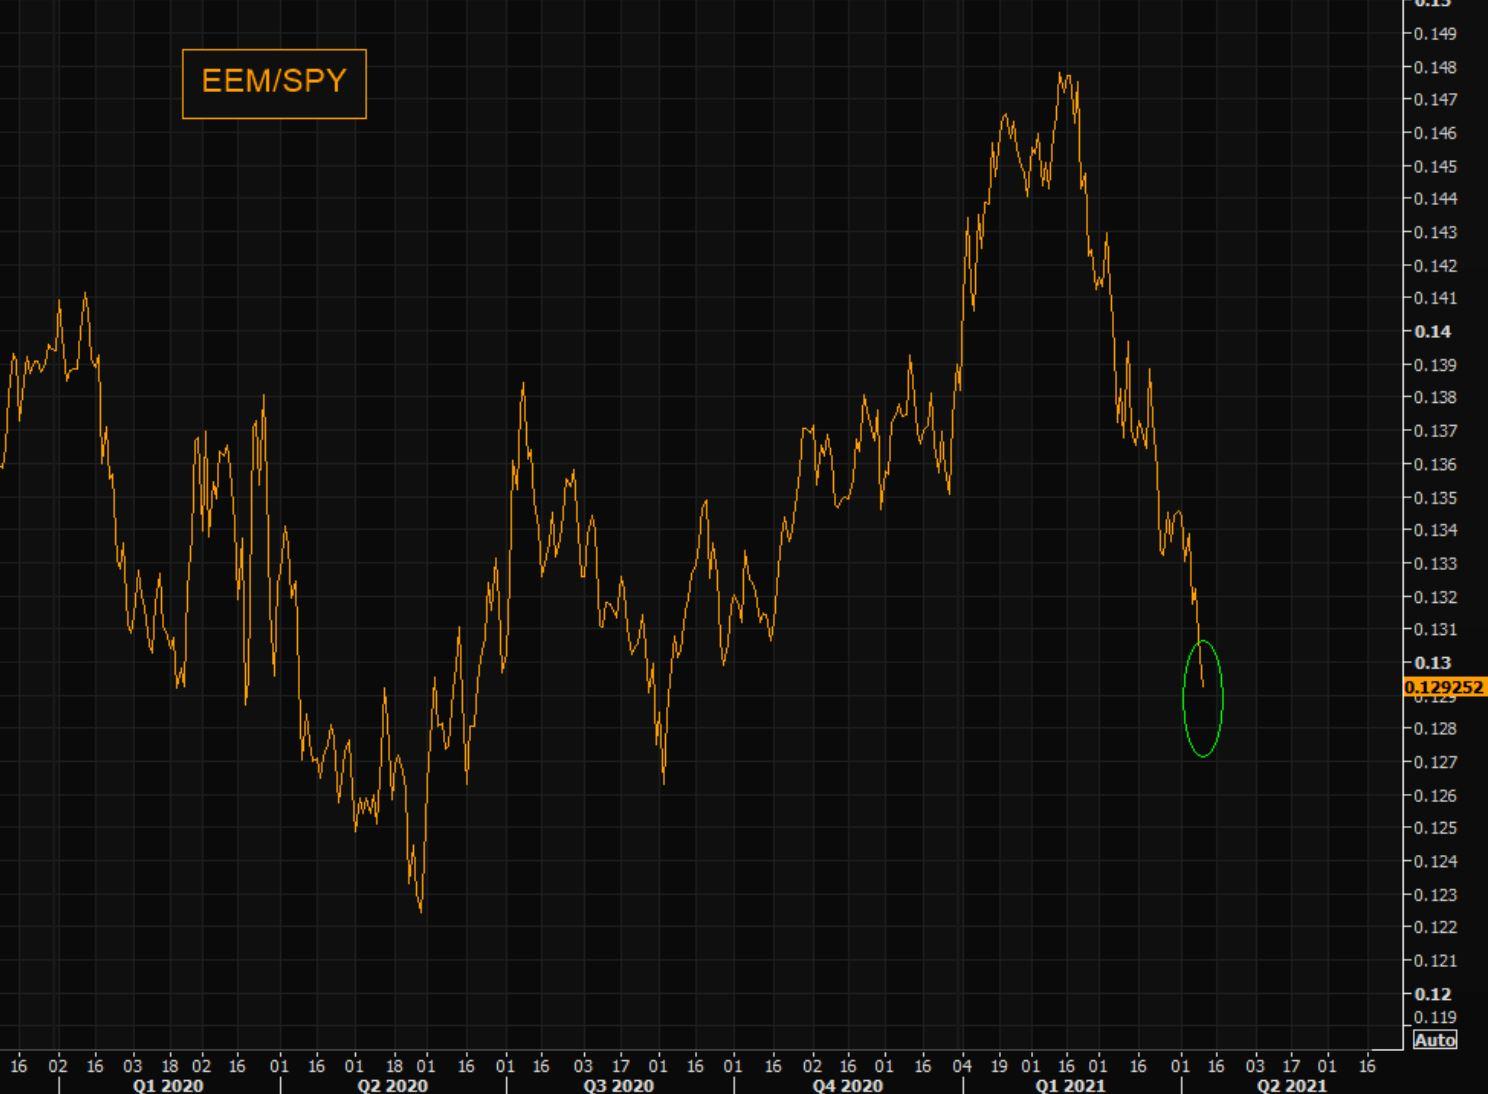 The Big EM Unwind: Emerging Markets vs. S&P 500 lowest since Q3